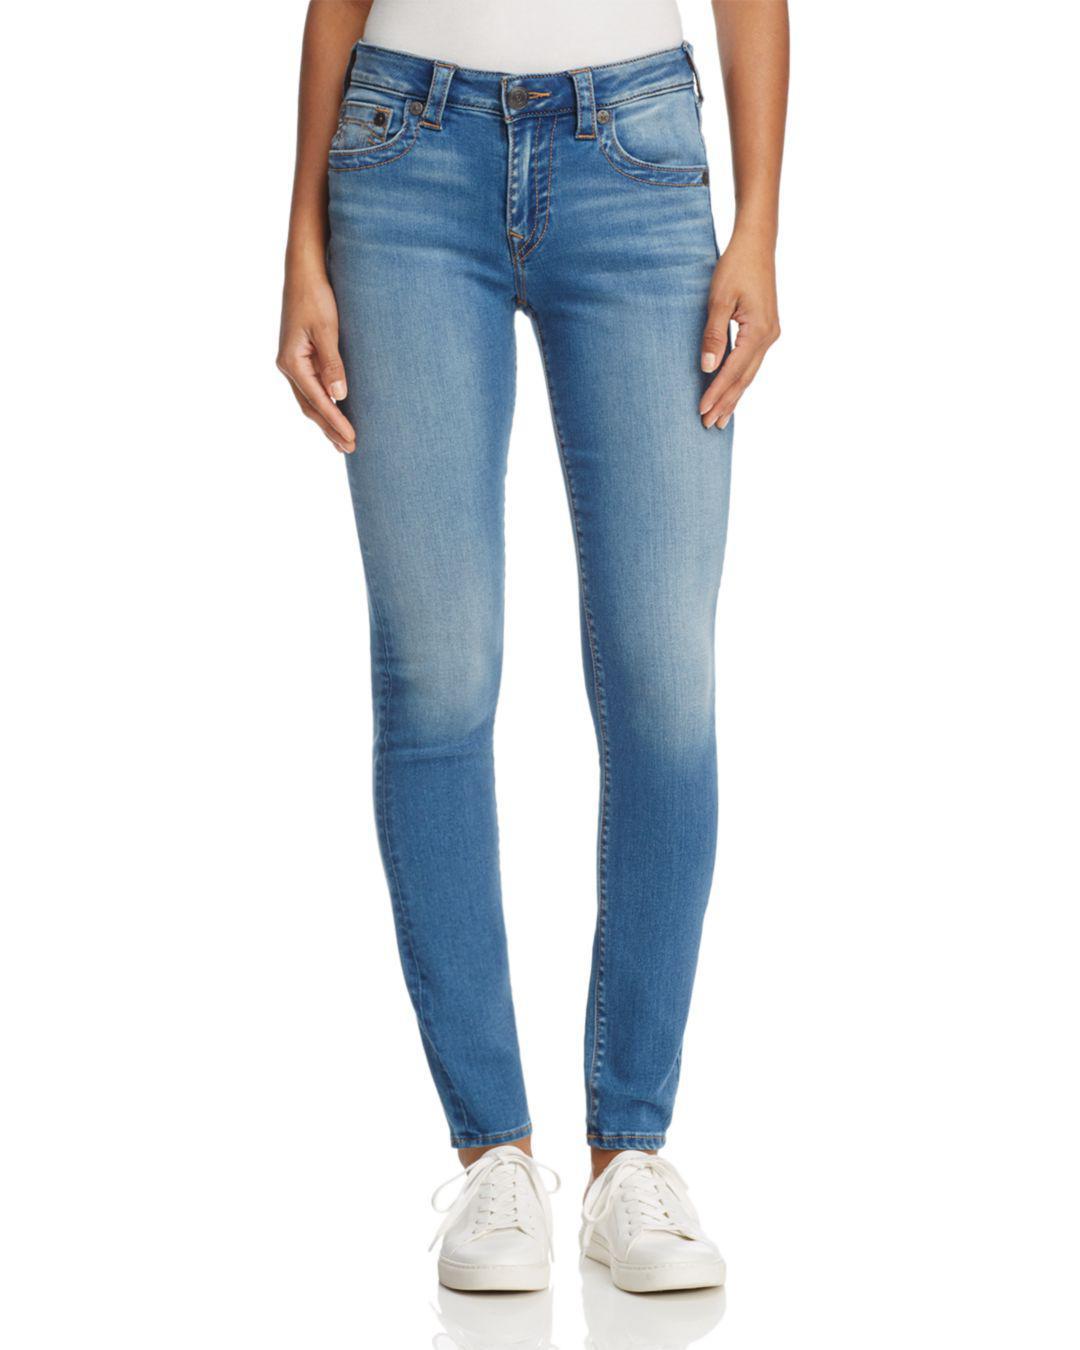 393139b1b94e4 True Religion Jennie Curvy Skinny Jeans In Authentic Indigo in Blue ...